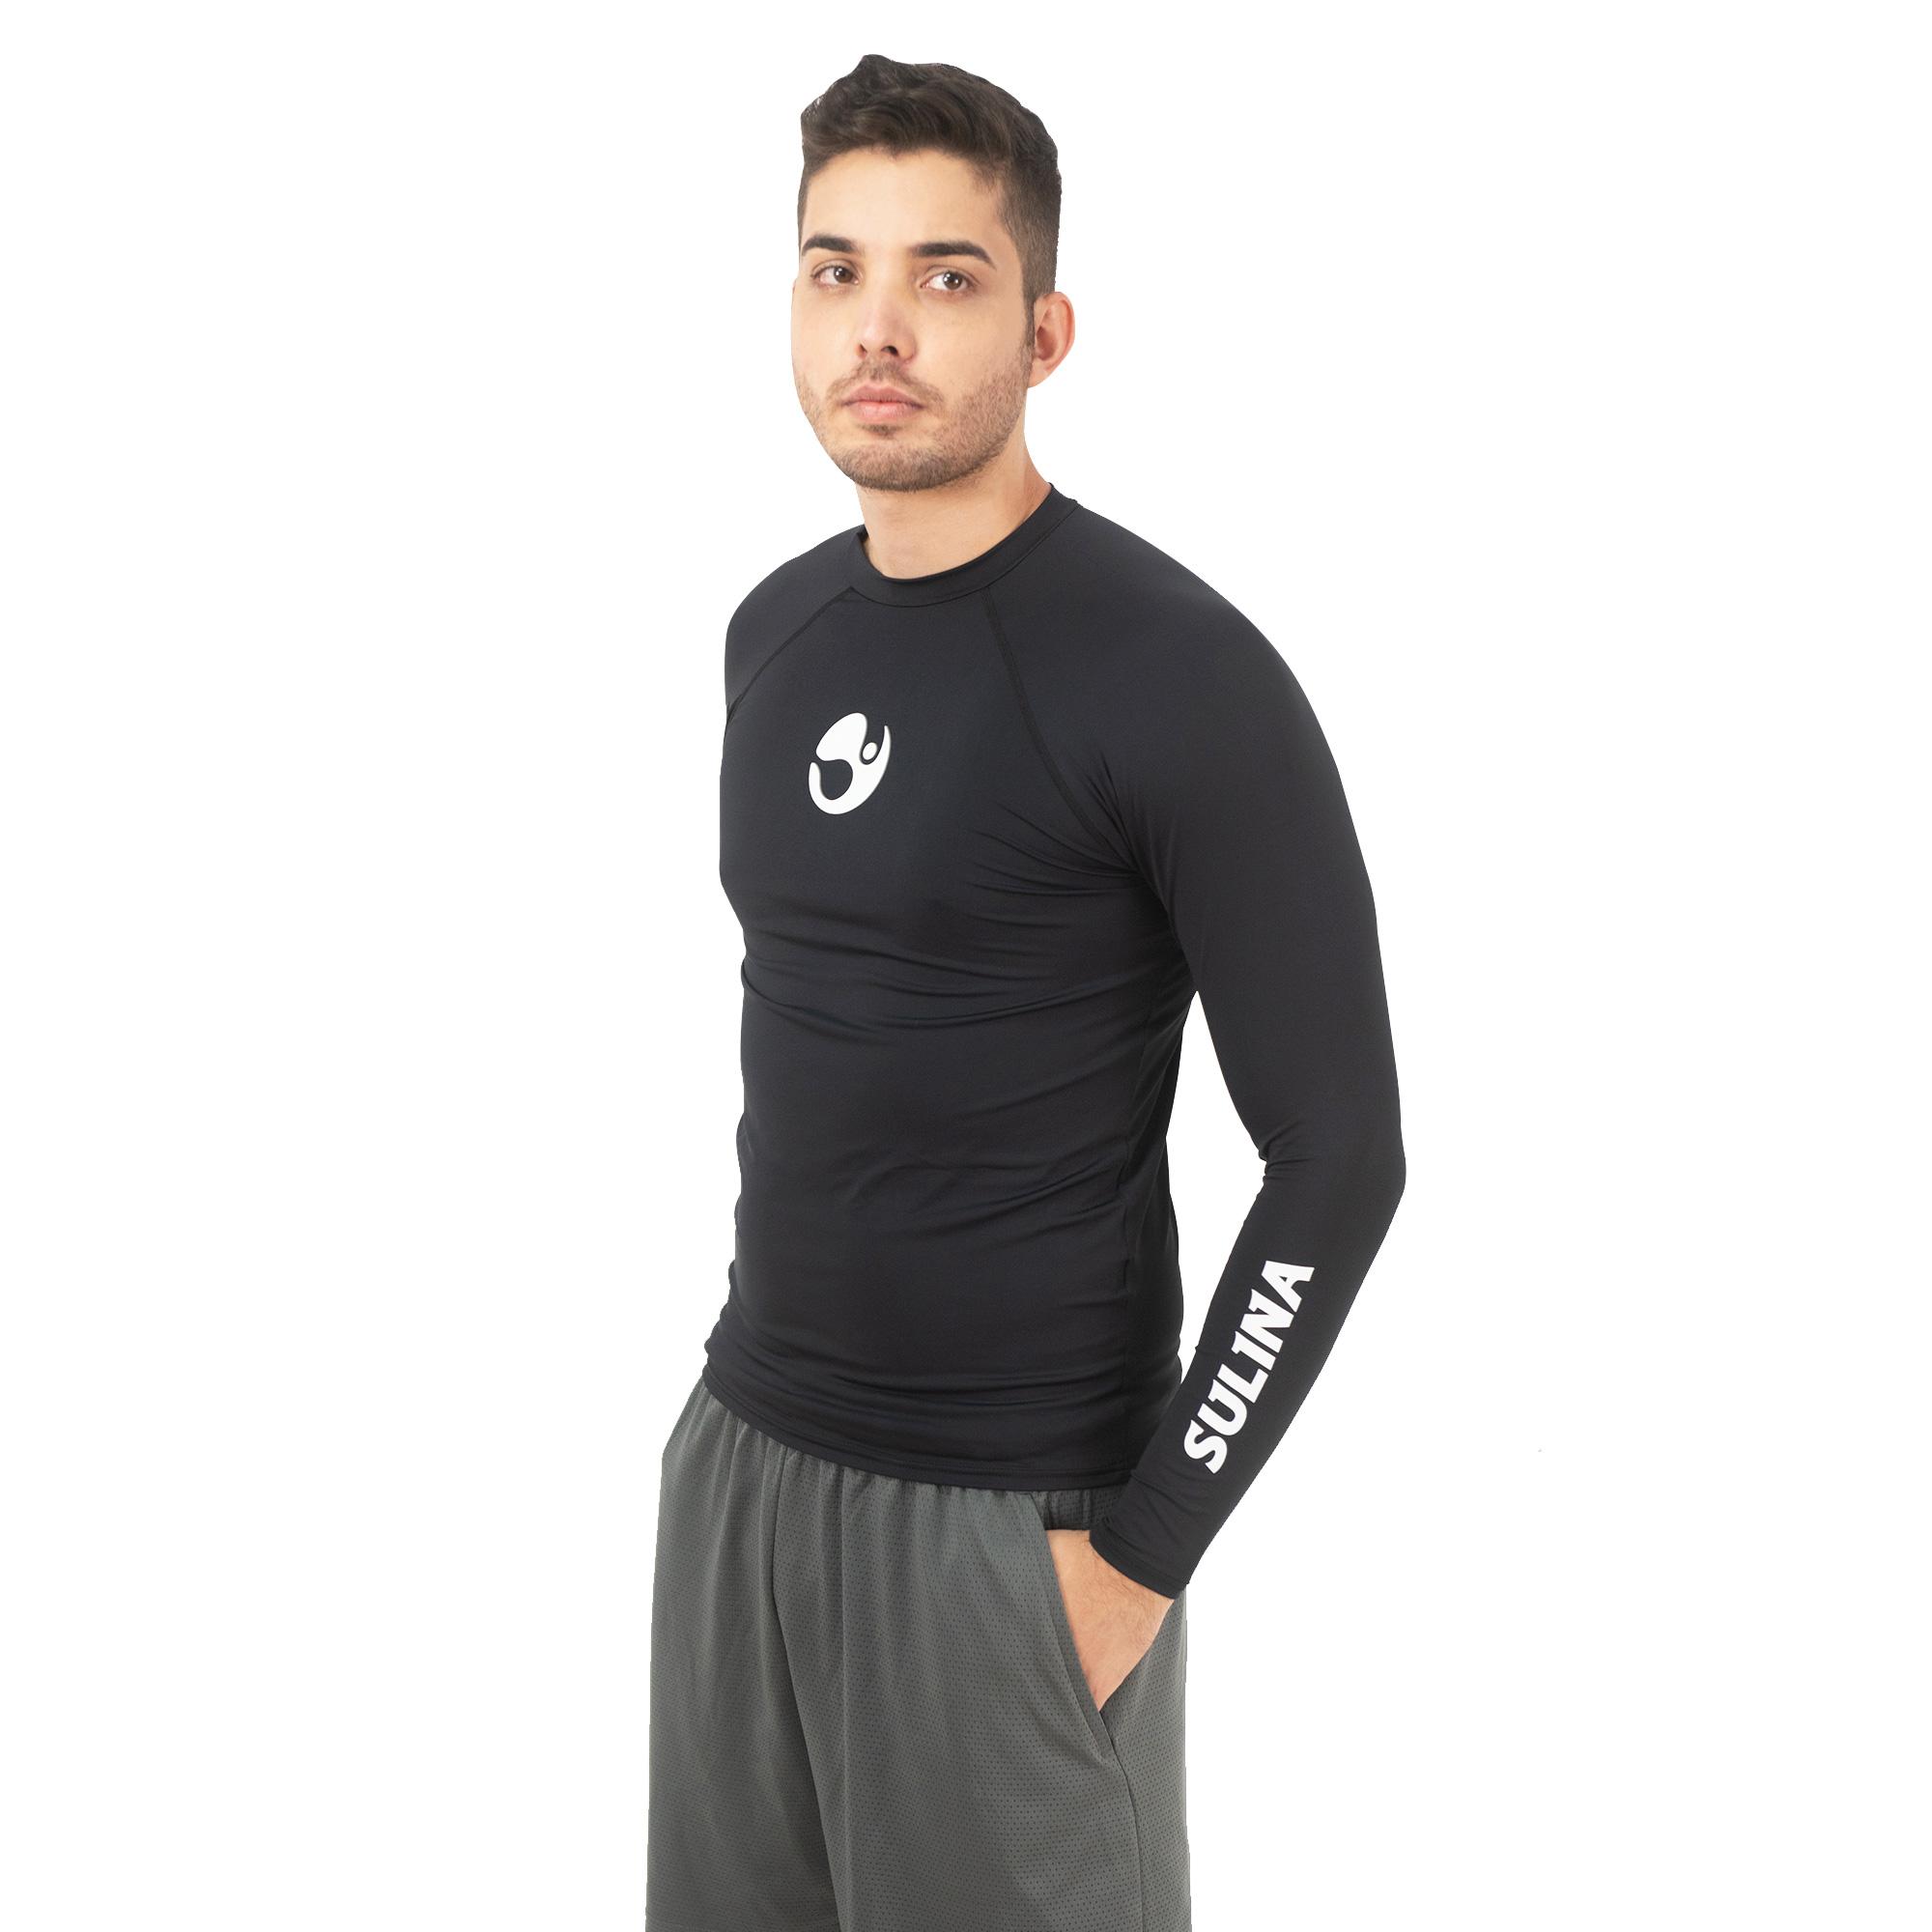 Camiseta Sulina Manga Longa UV 50+  Térmica Preta